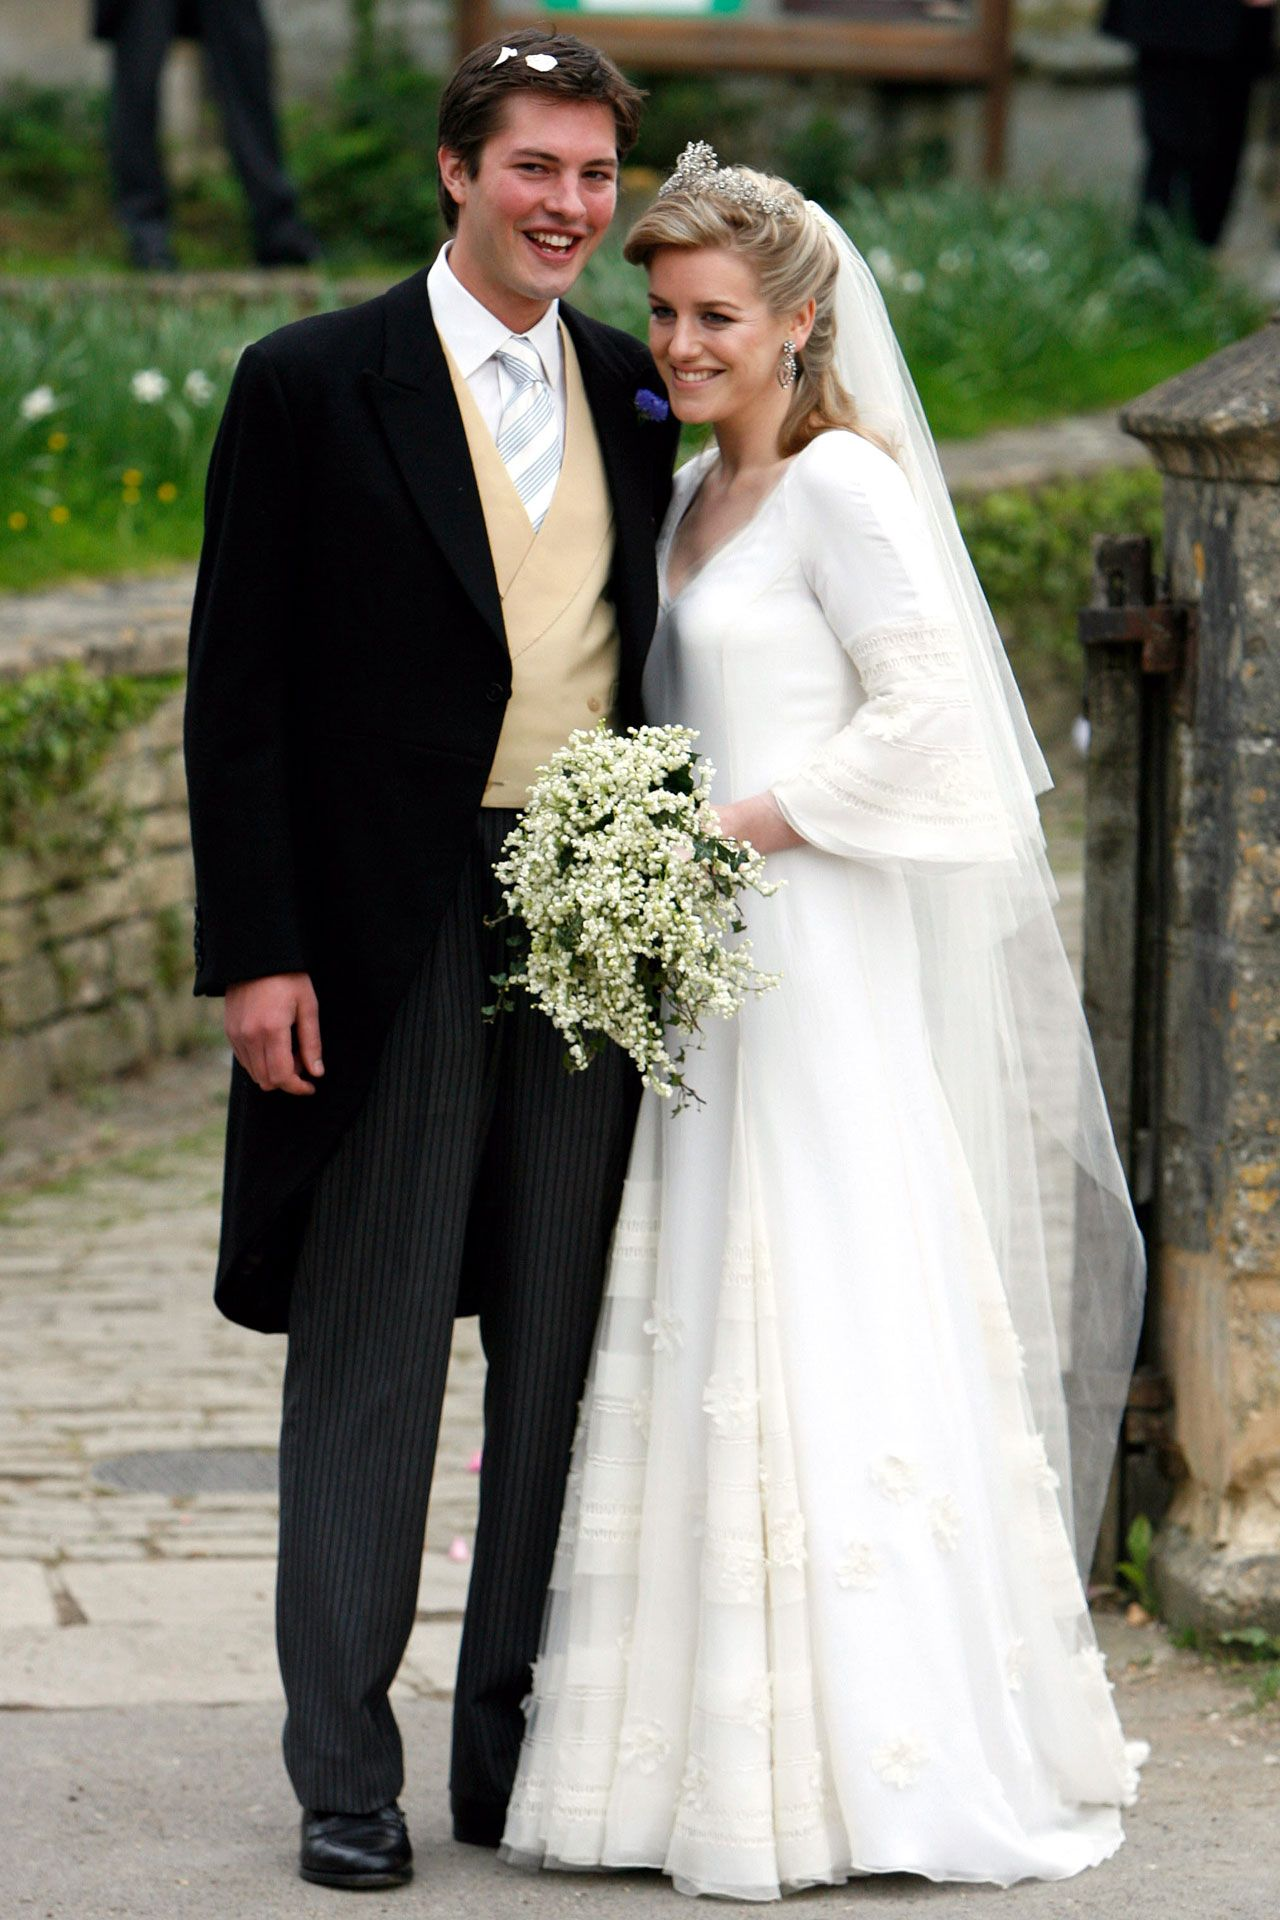 Wedding Ideas, Planning & Inspiration Royal weddings